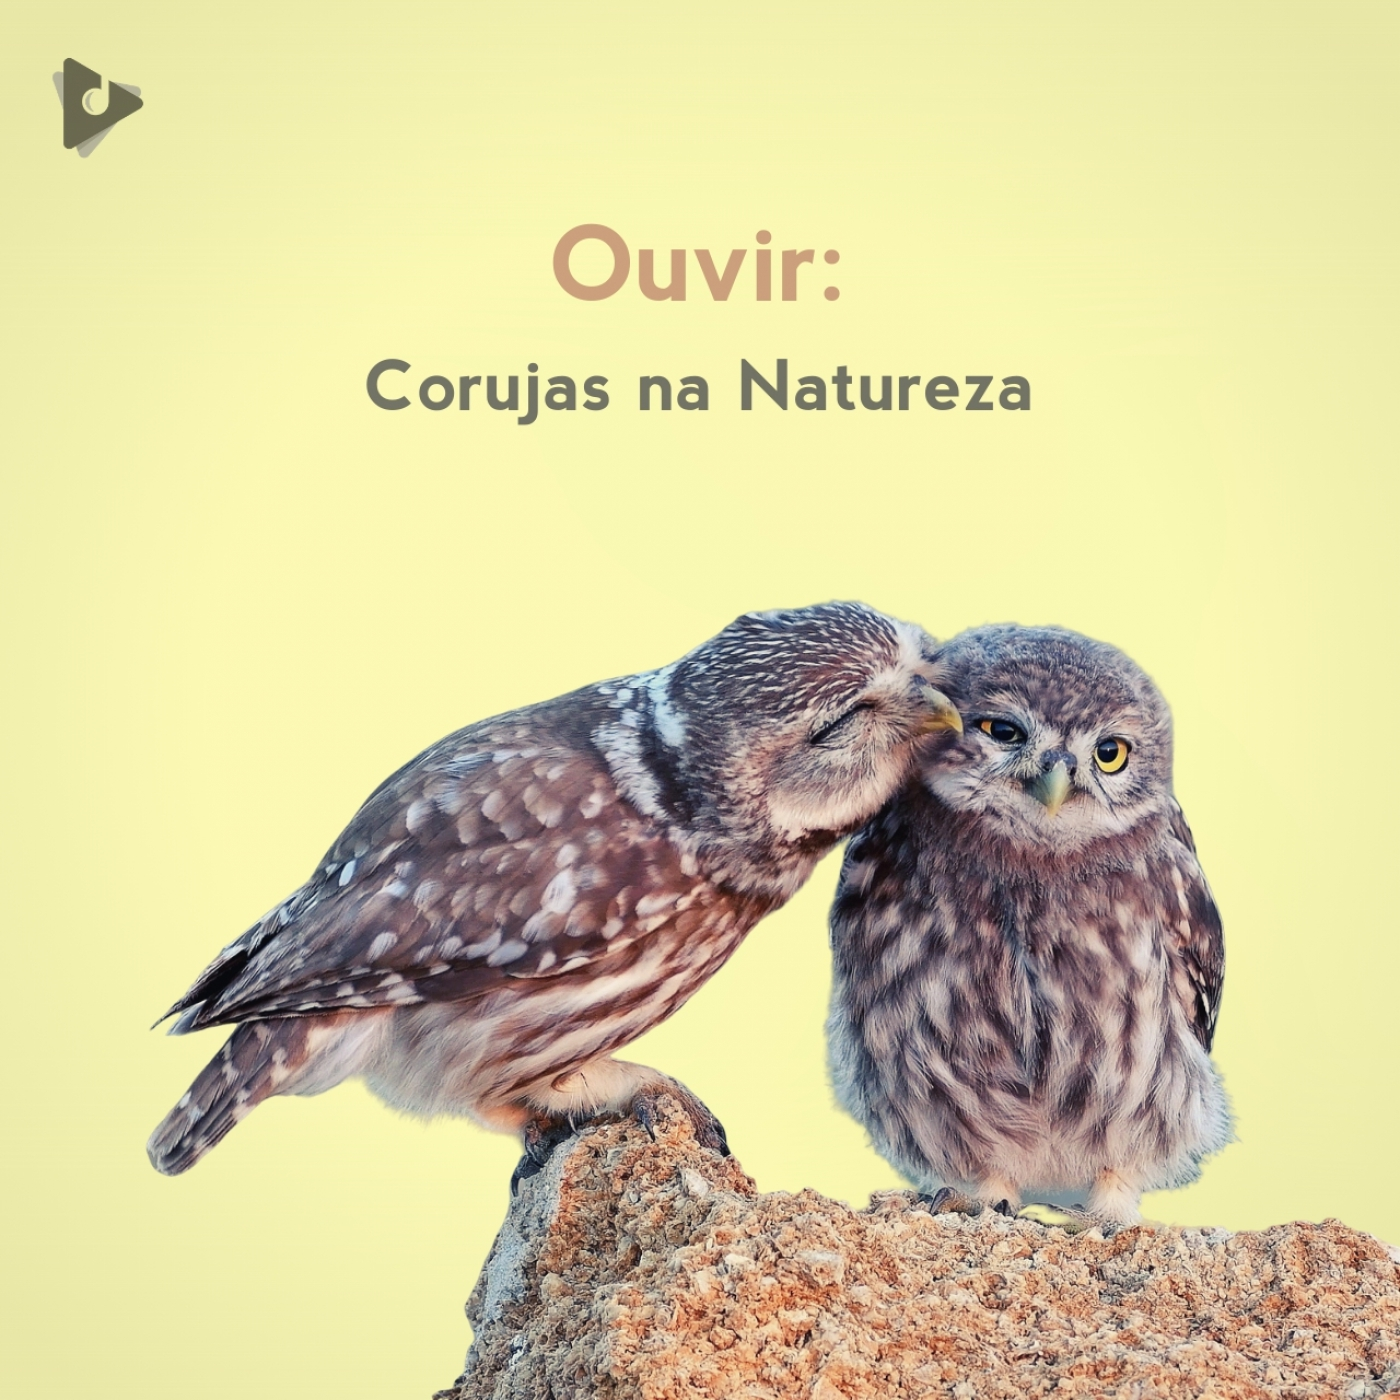 Ouvir: Corujas na Natureza